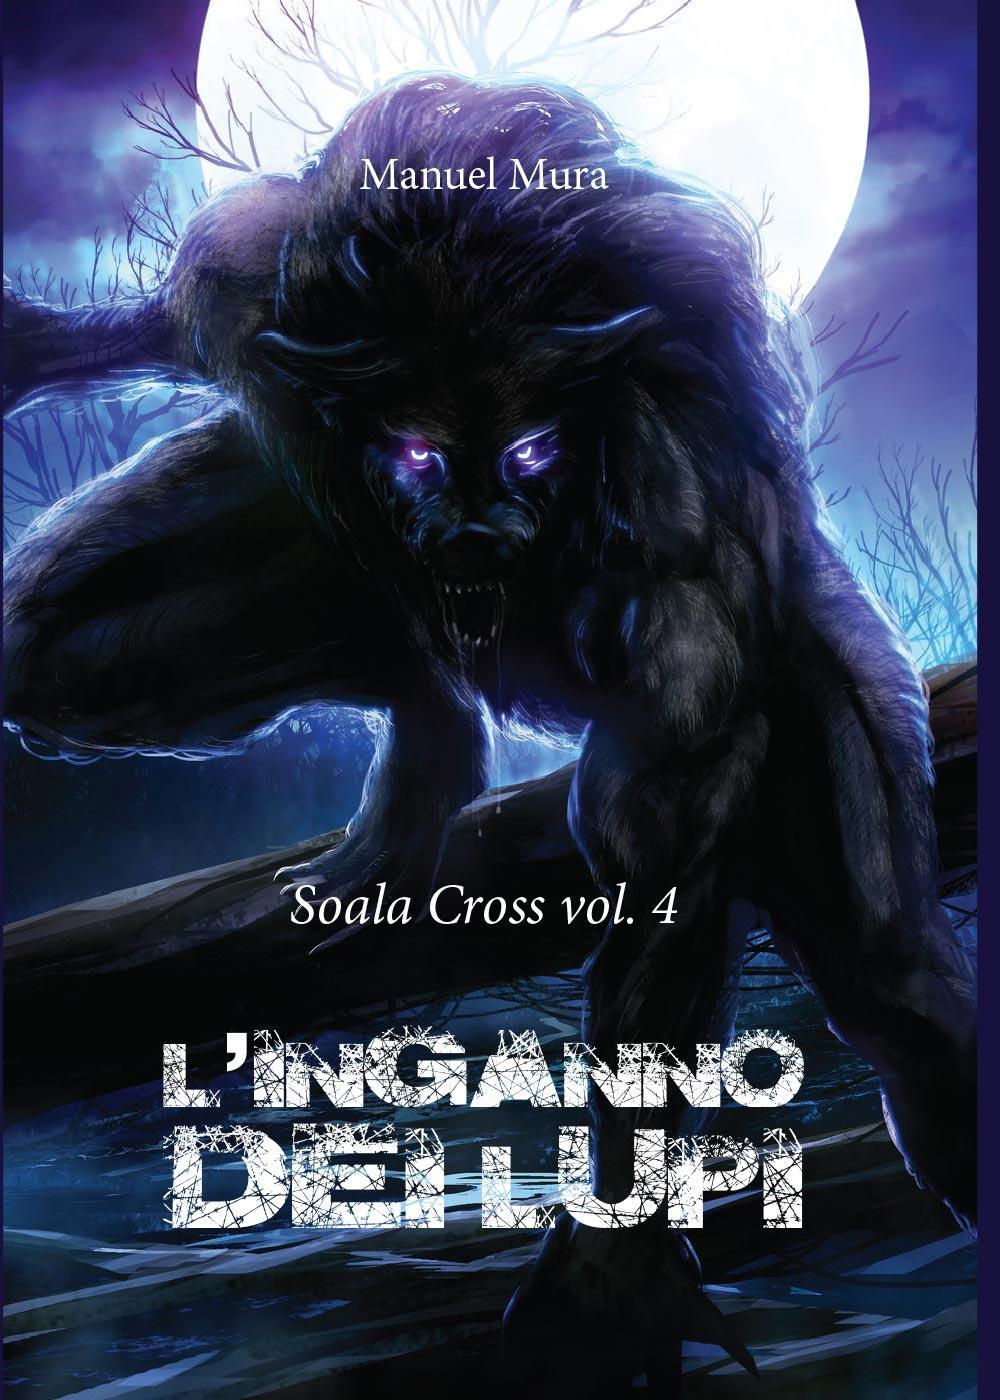 Soala Cross vol.4 - L'inganno dei lupi